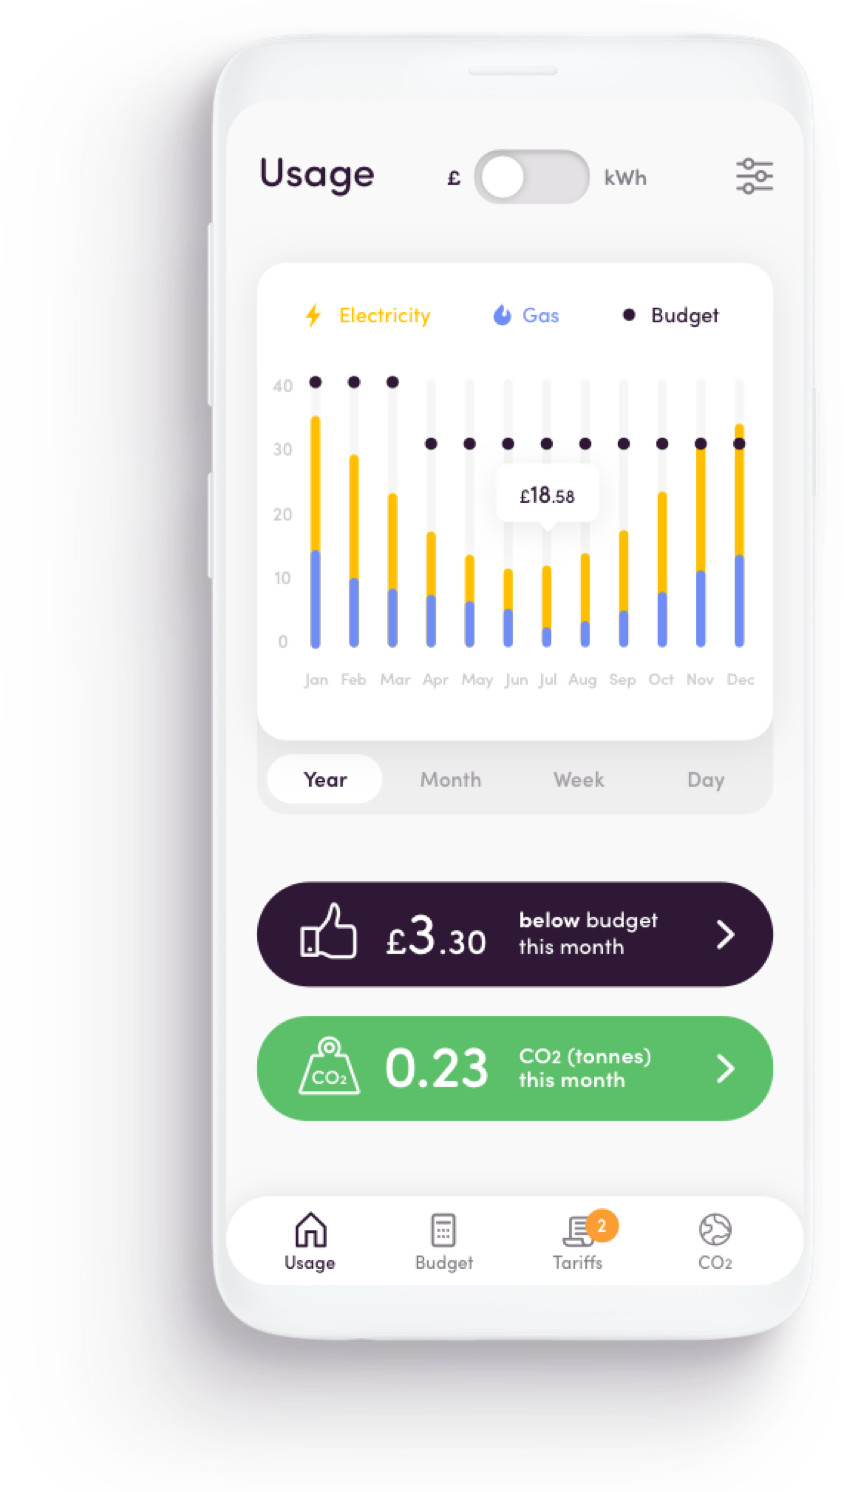 App screen - Usage